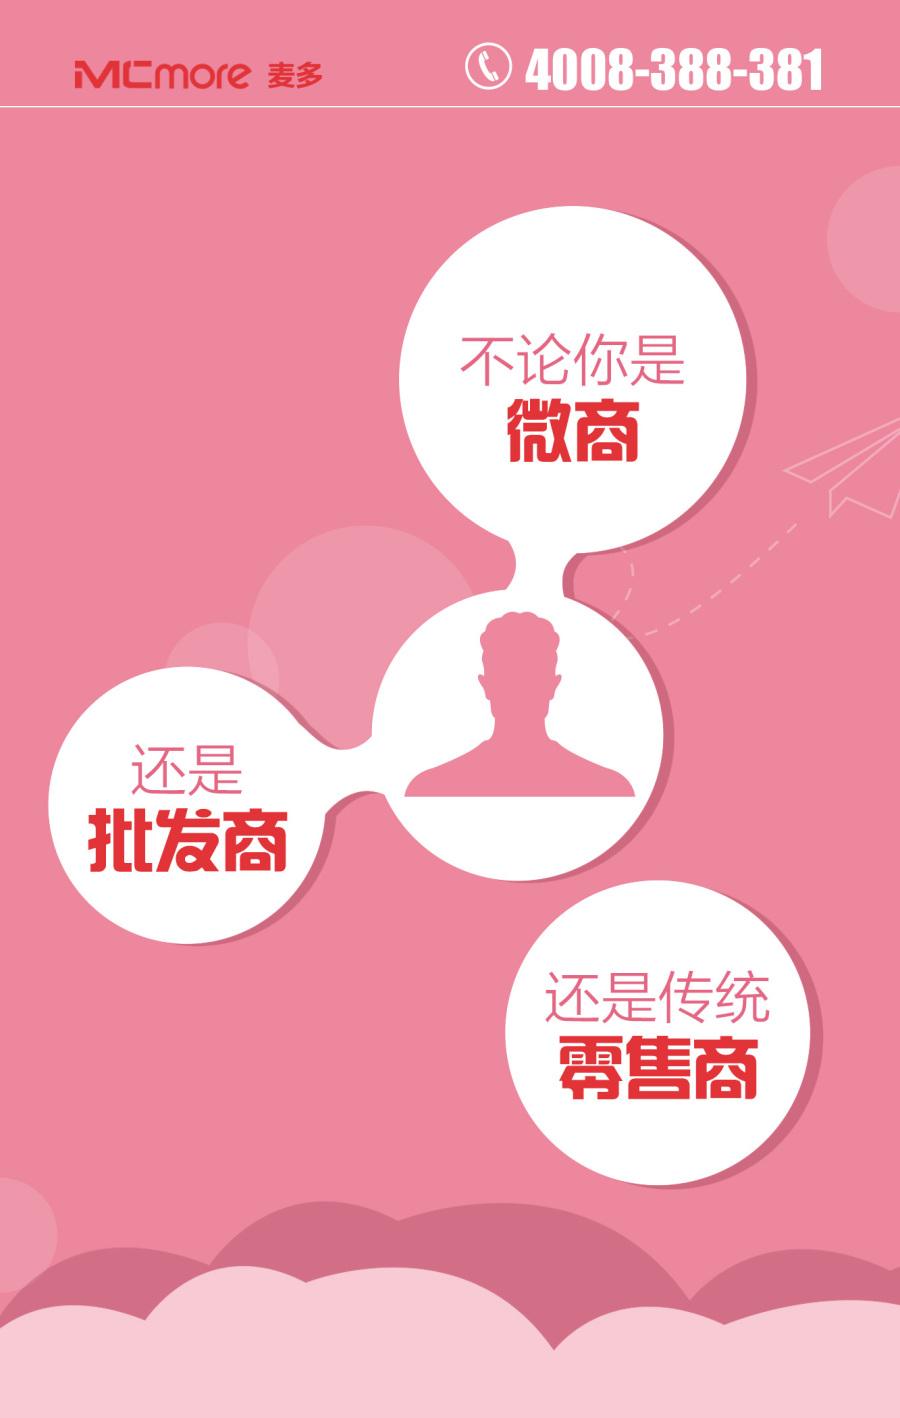 Mcmore微信商城H5活动开发|海报|平面|LIN帅哥